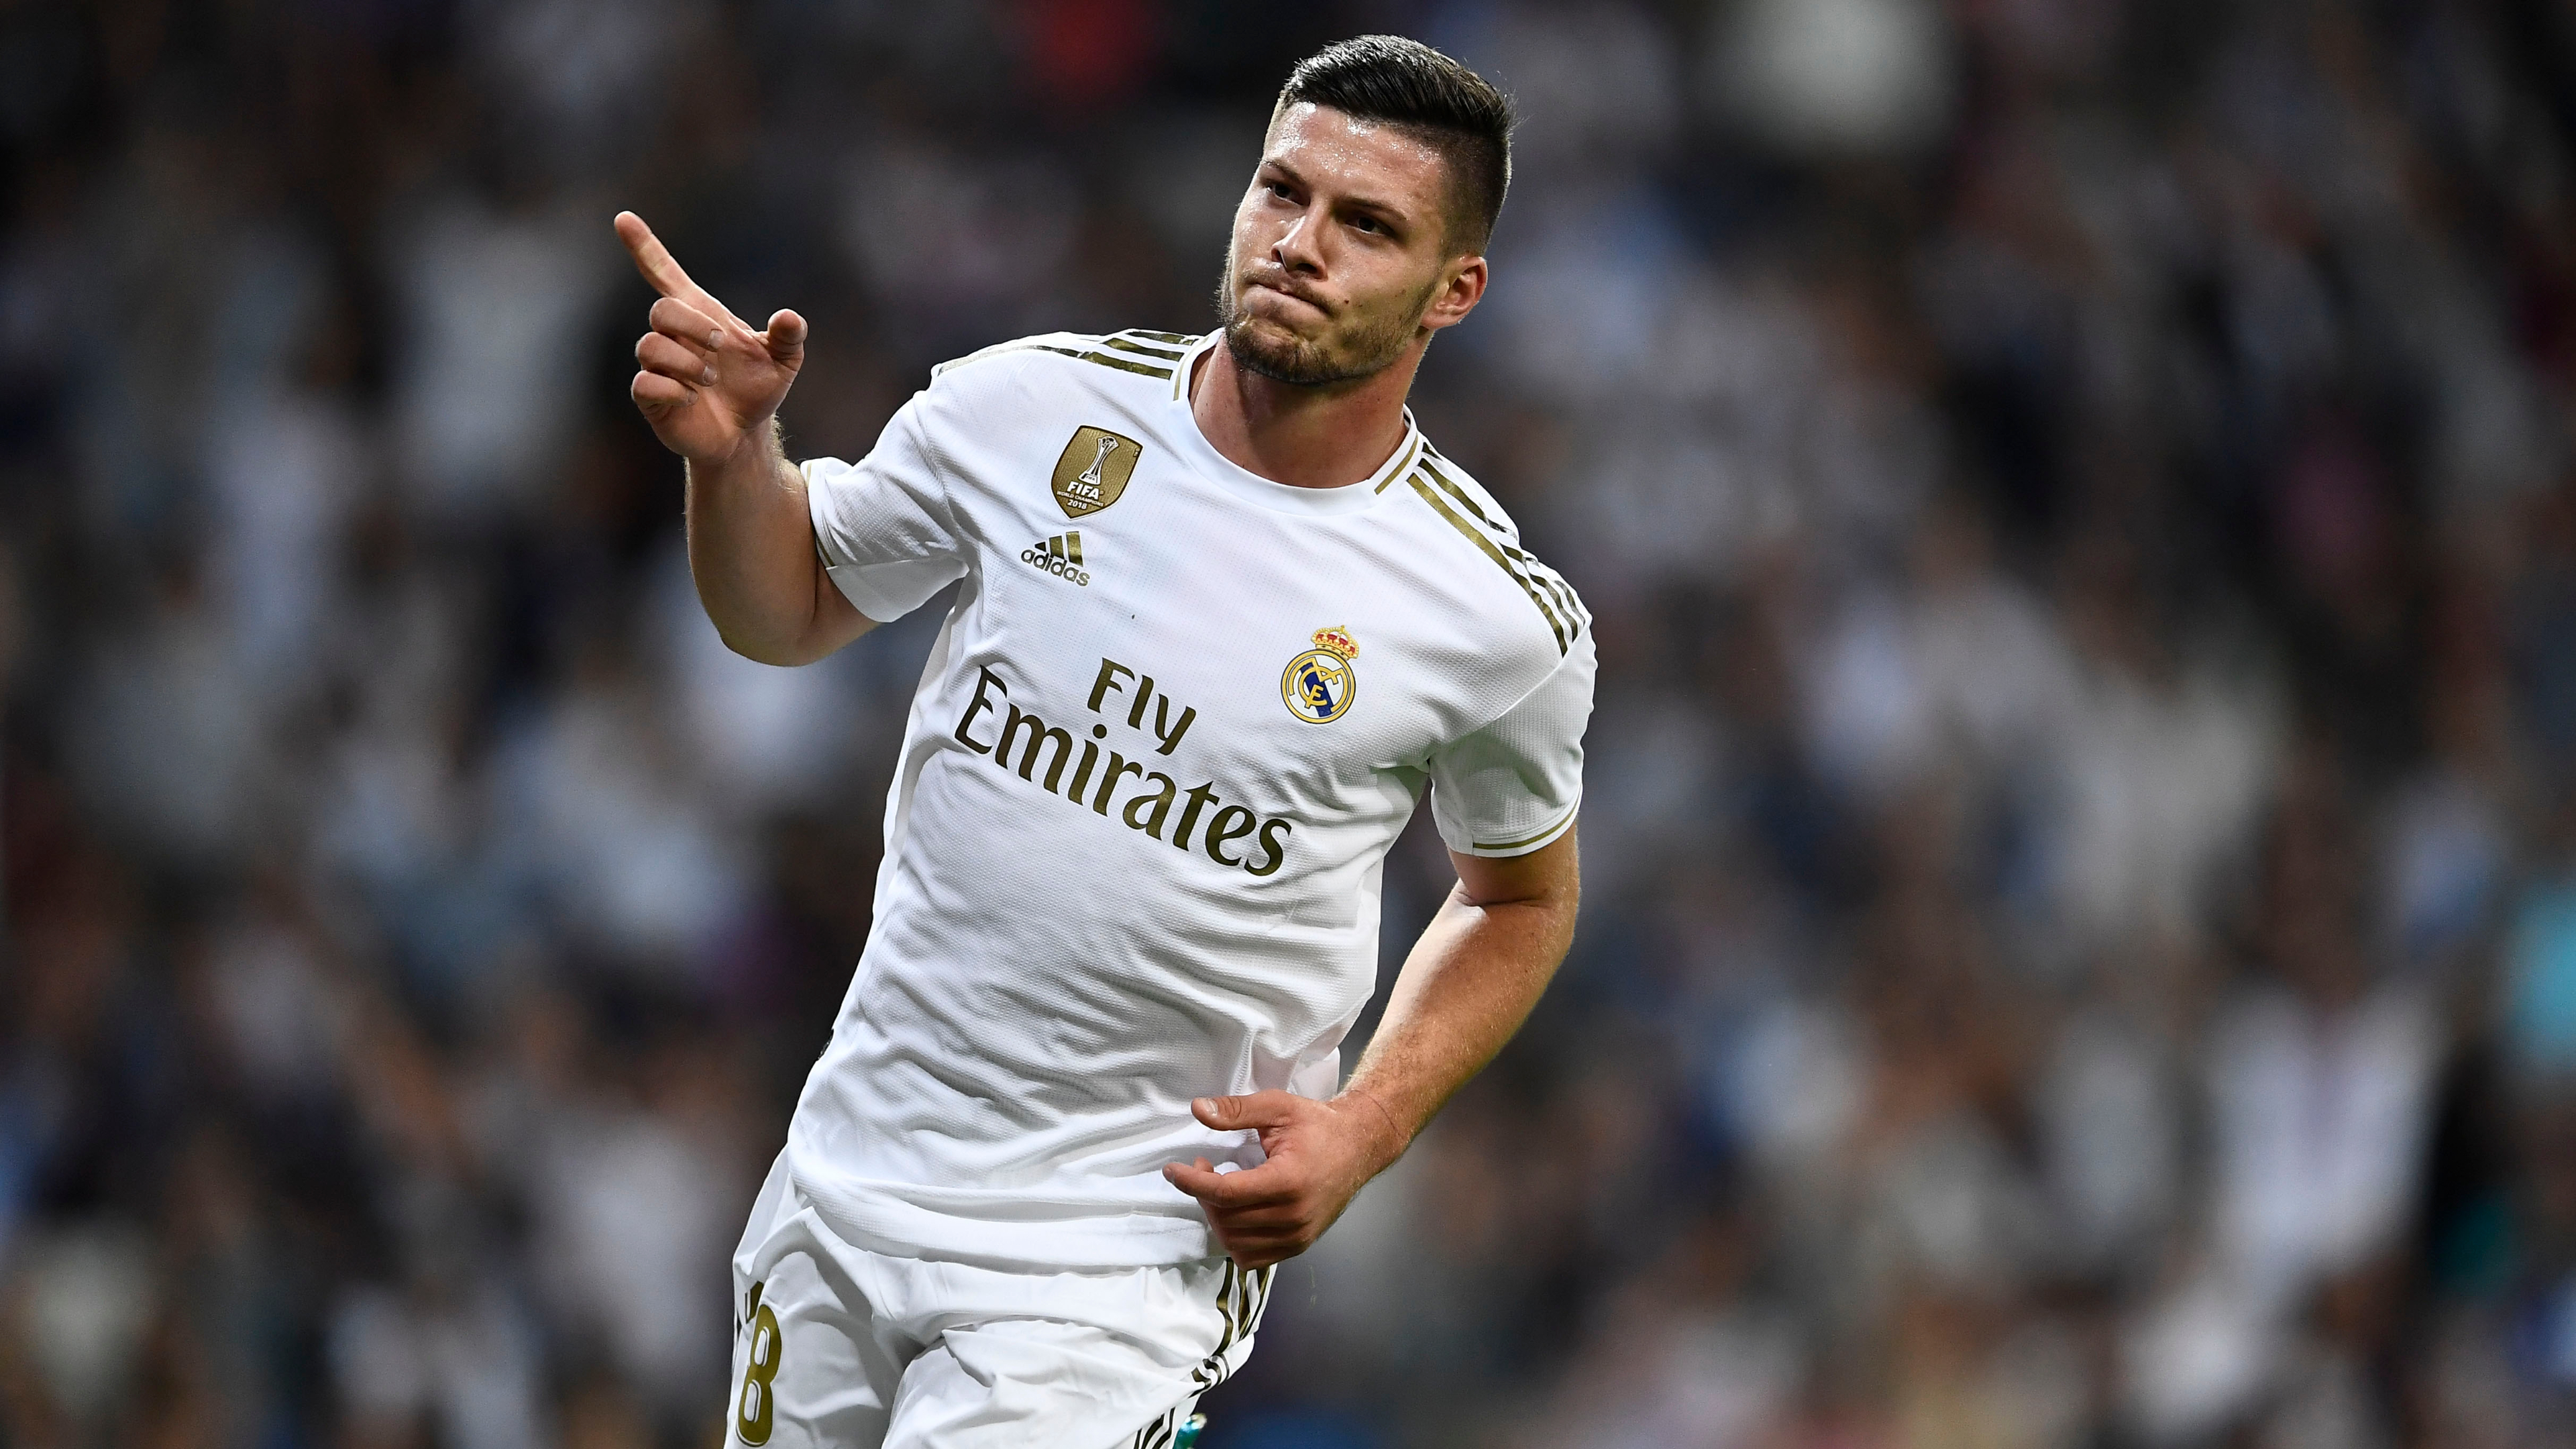 Real Madrid, la stat très peu flatteuse de Luka Jovic